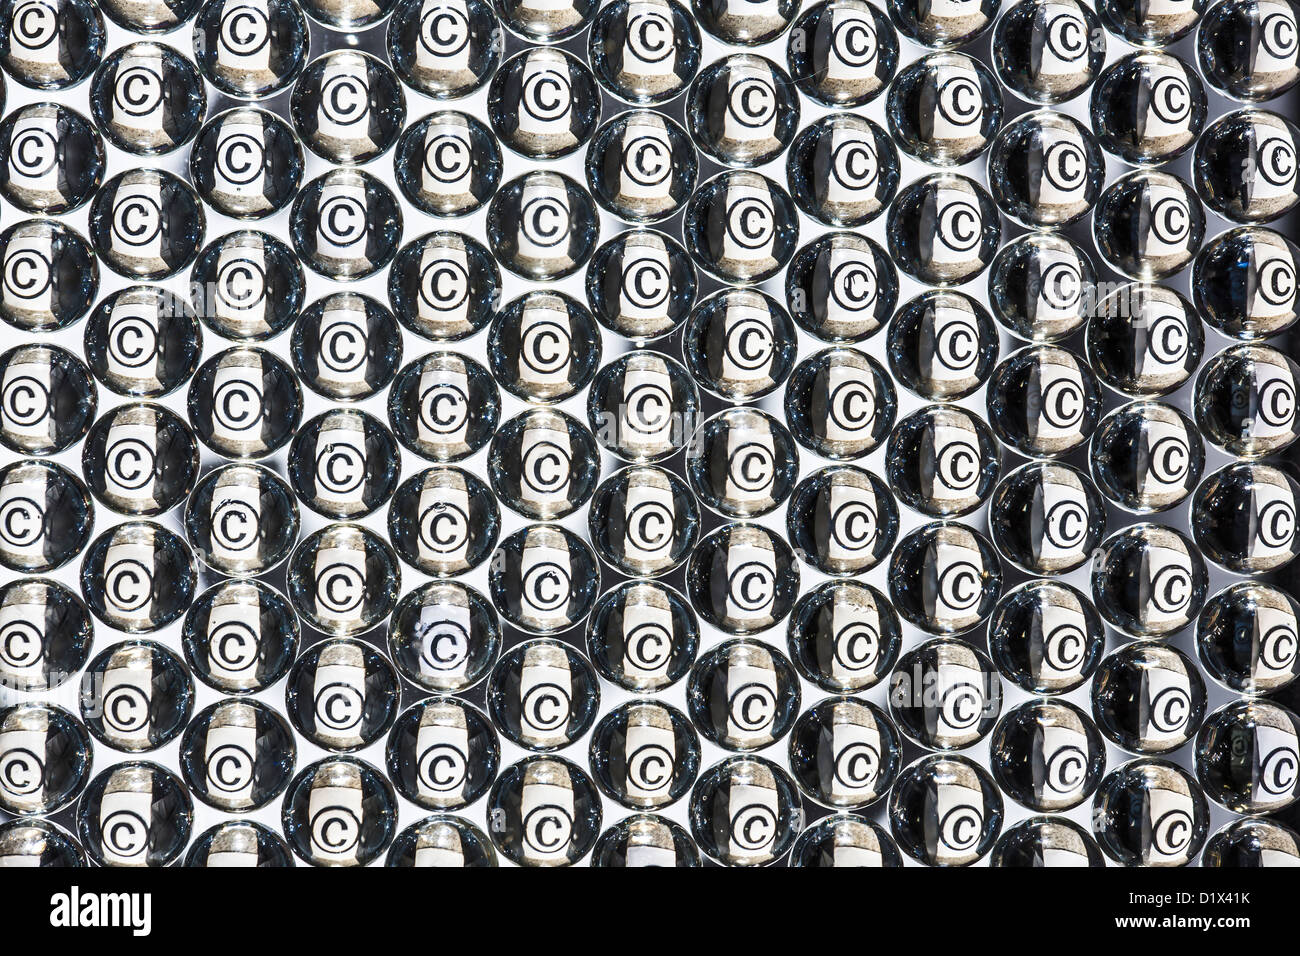 Copyright Symbol In Matrix Of Tiny Glass Balls Stock Photo 52819695